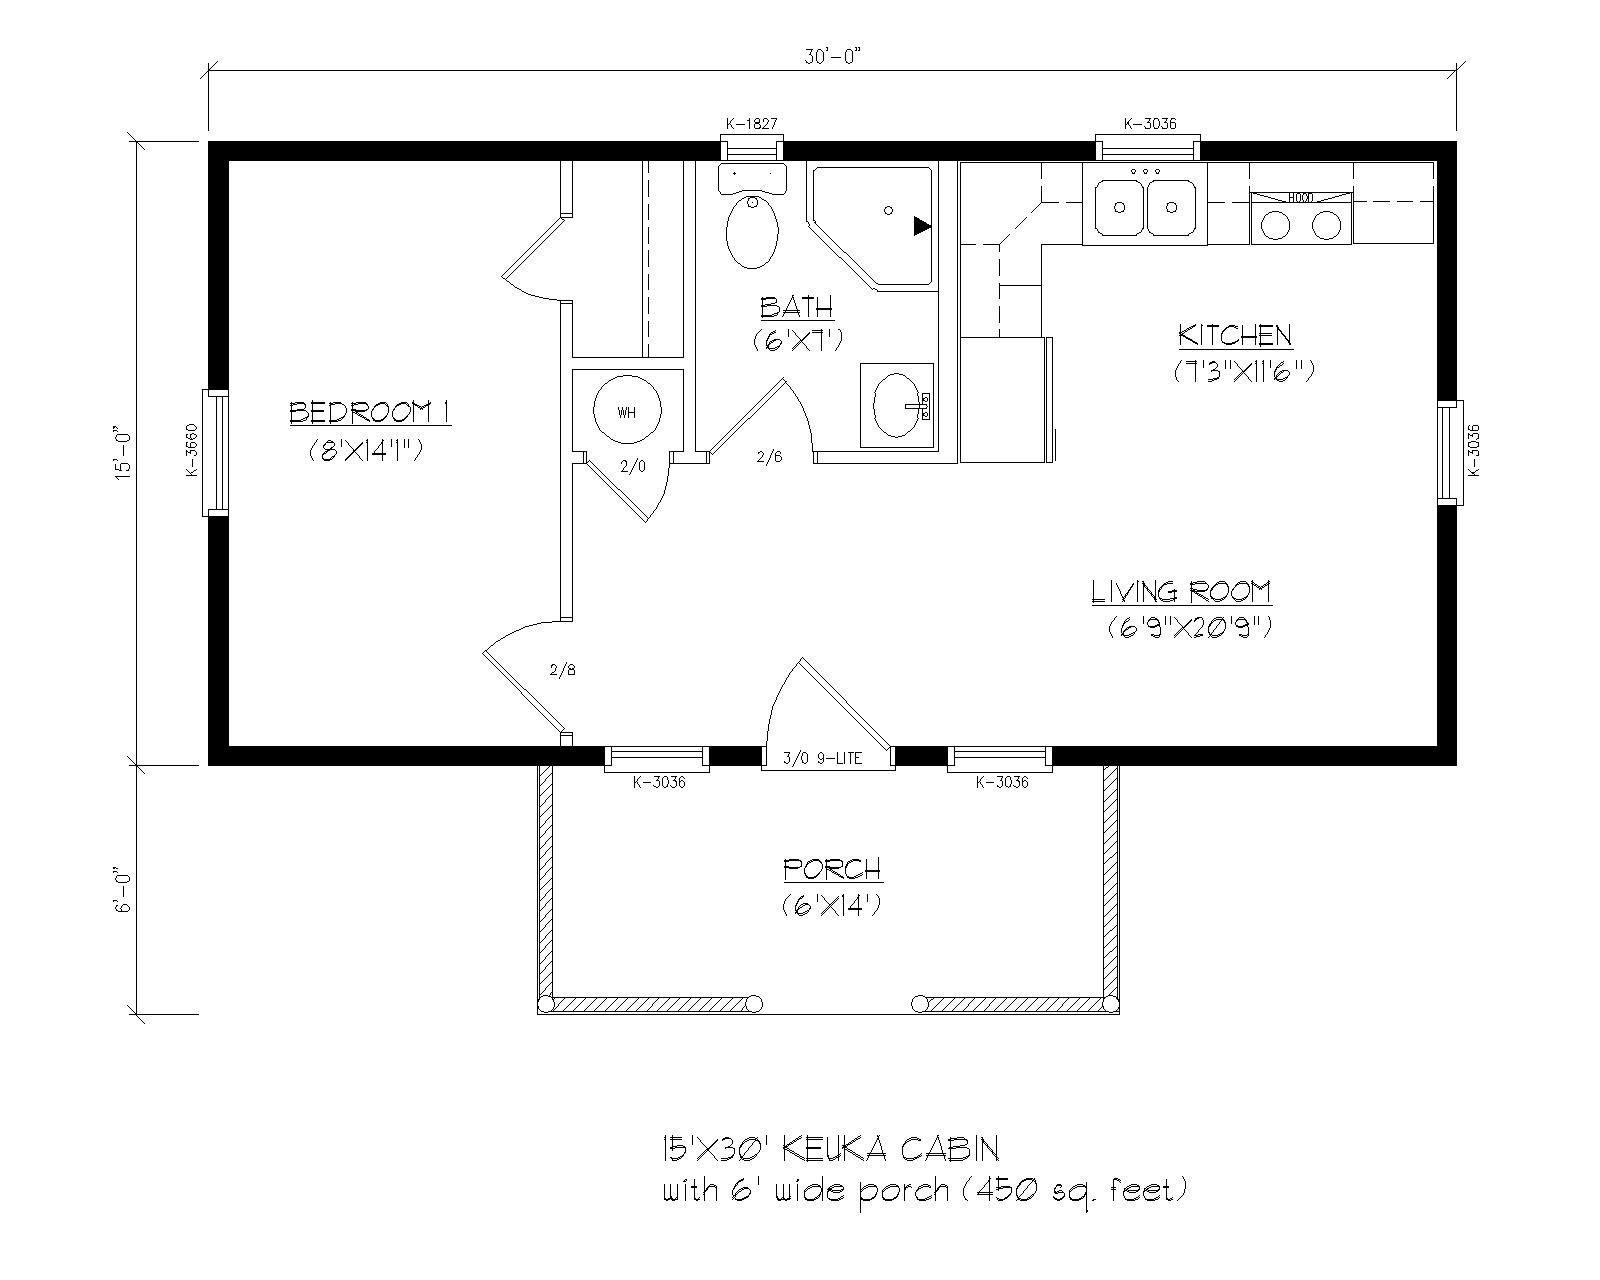 Riverwood Prefab Certified Modular Cabin Riverwood Cabins Cabin Floor Plans Modular Cabins Cabin Floor